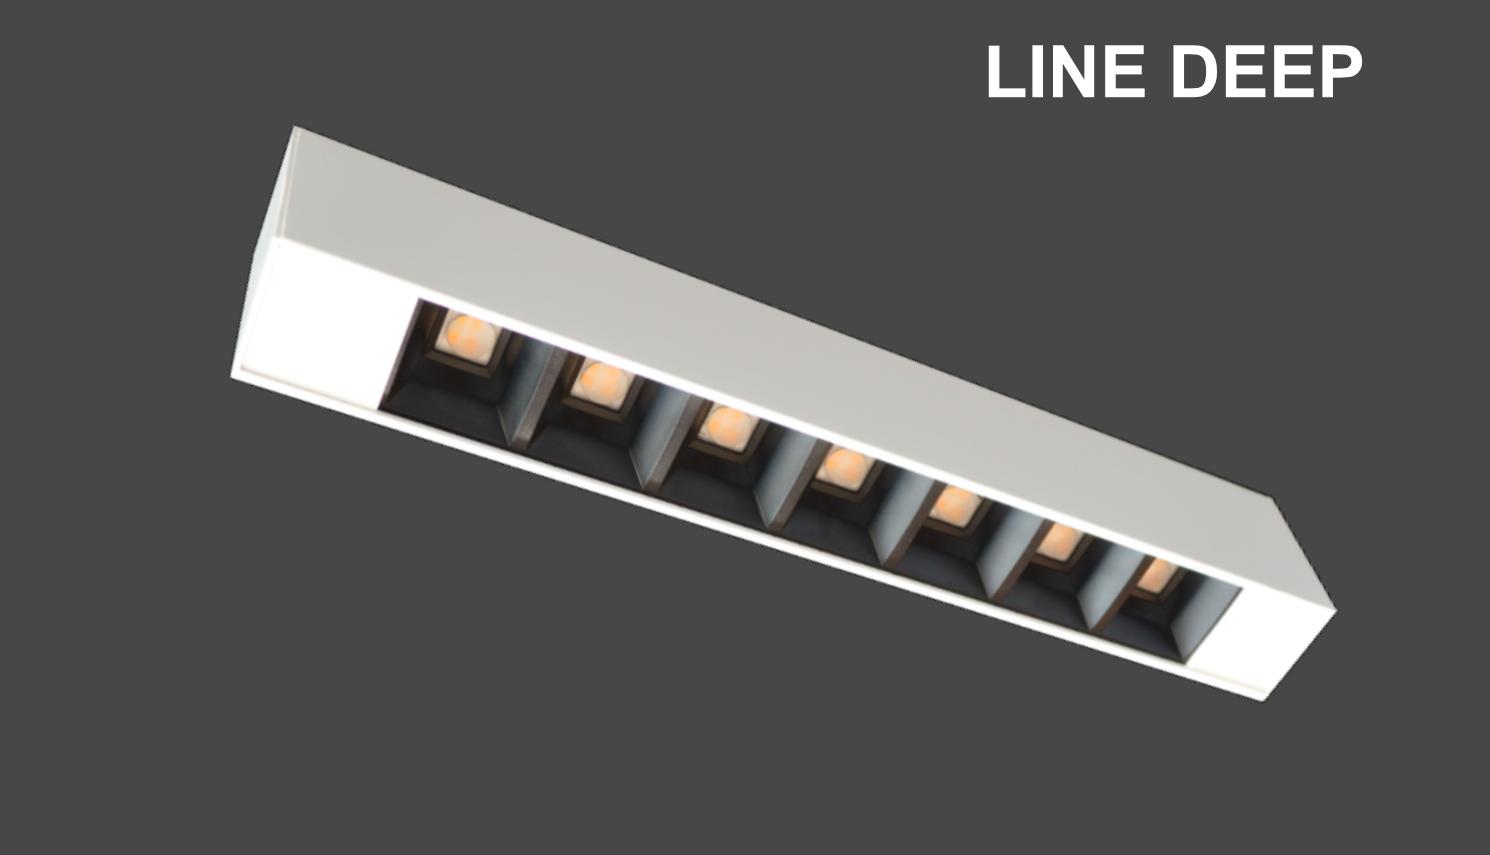 LINE DEEP